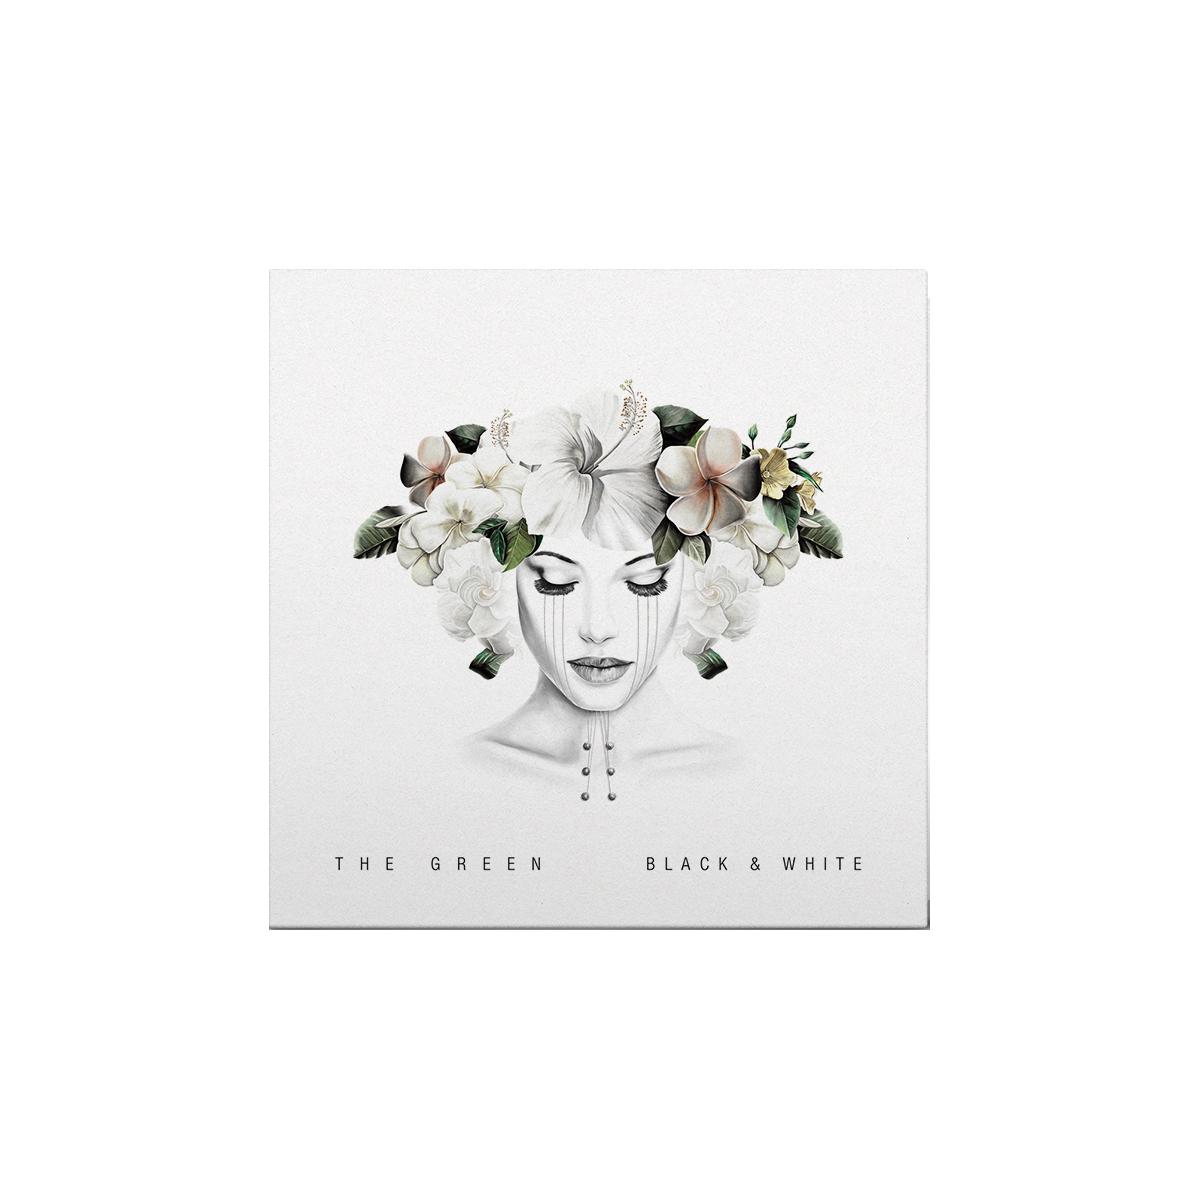 The Green: Black & White Digital Download